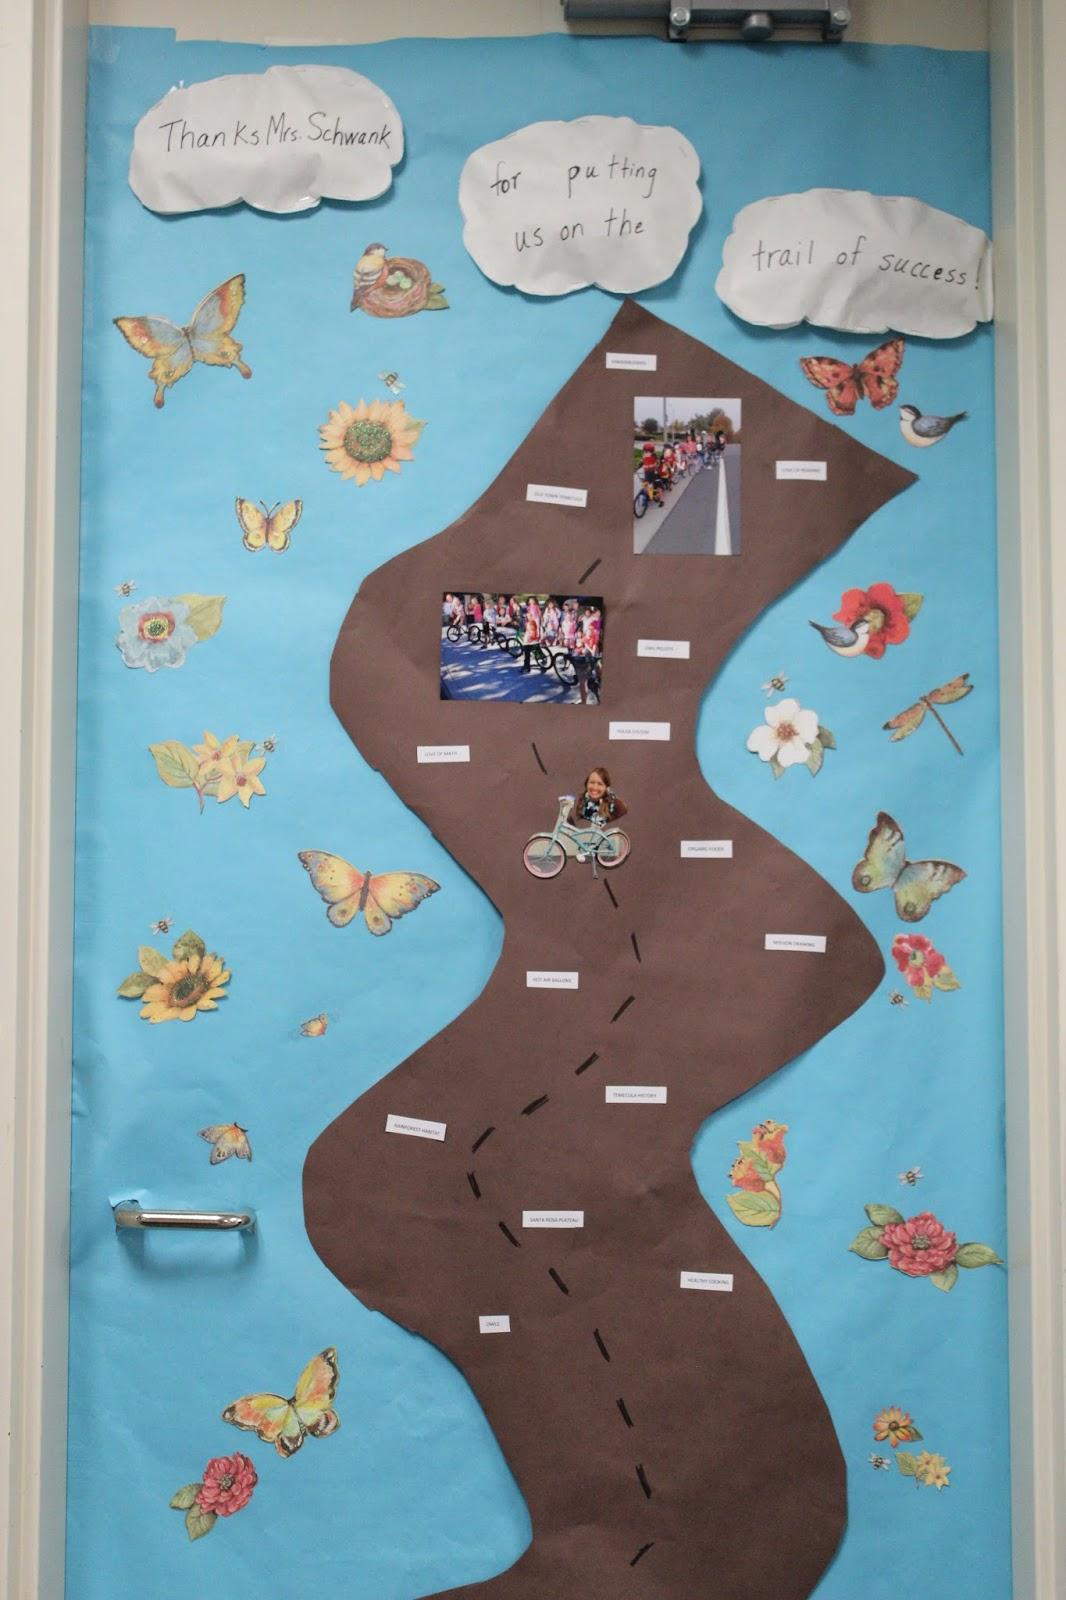 Classroom Decoration Ideas Questions : Four marrs and one venus teacher appreciation ideas